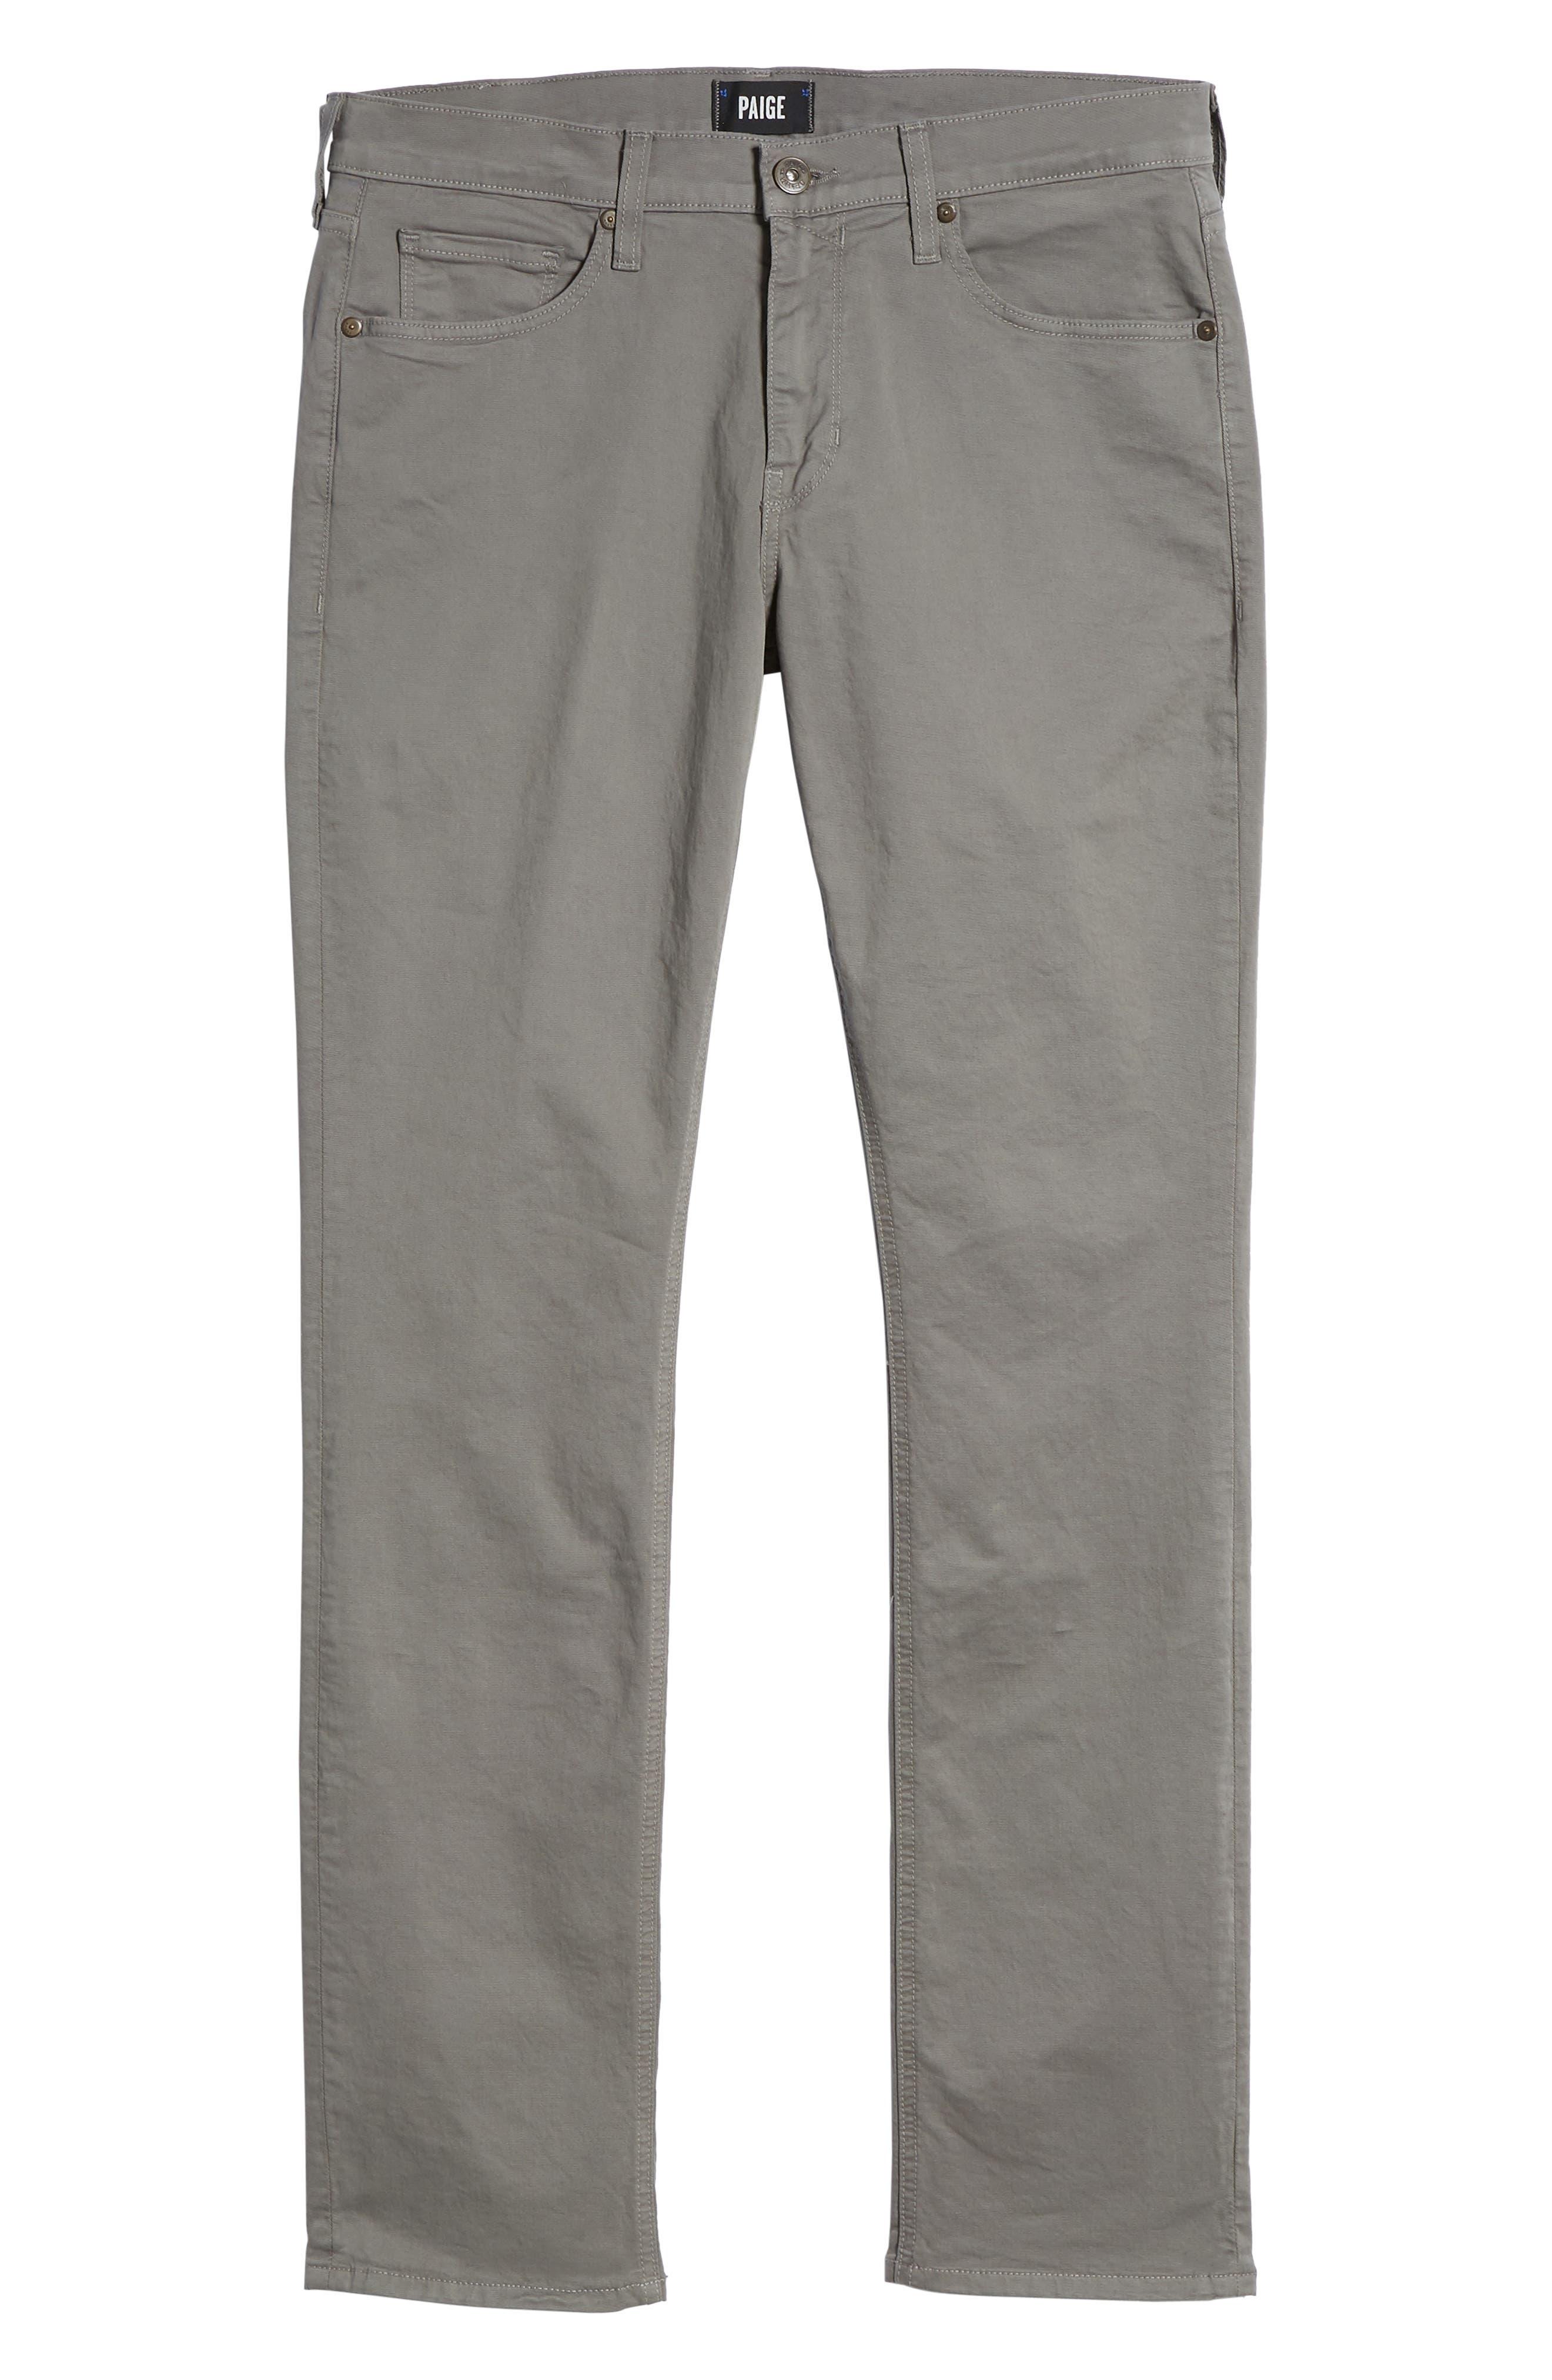 'Federal' Slim Straight Leg Twill Pants,                         Main,                         color, Granite Stone